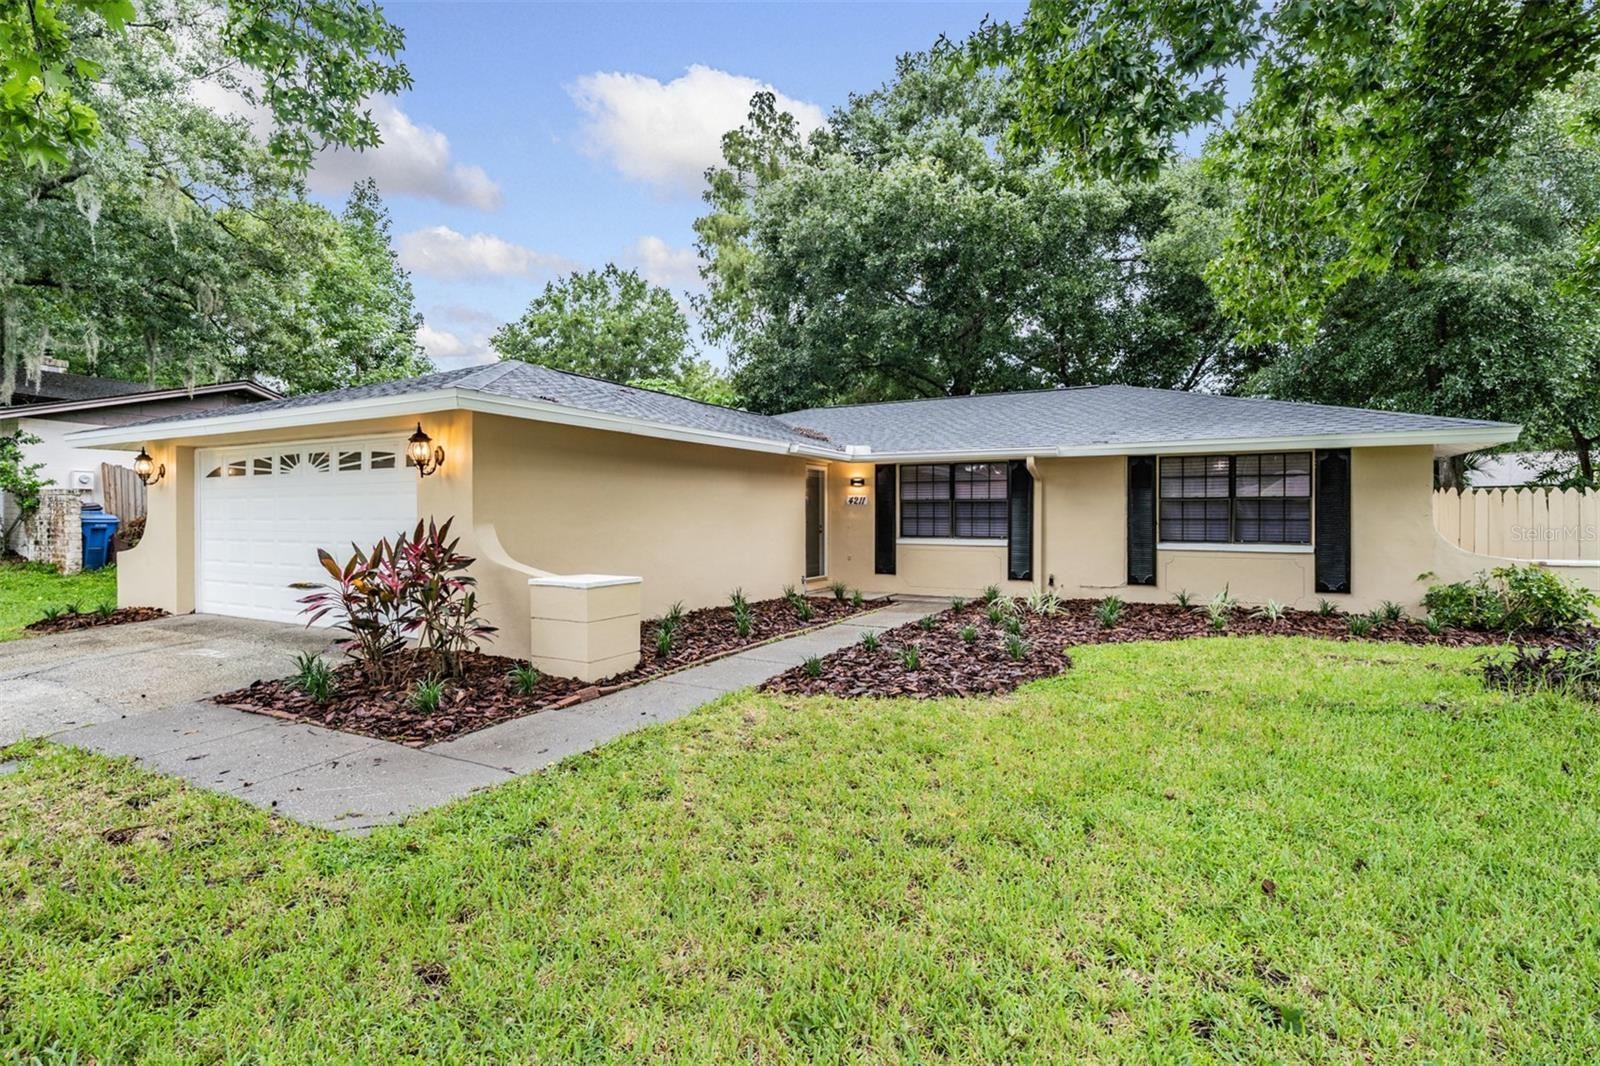 4211 BRIARBERRY LANE, Tampa, FL 33624 - MLS#: T3323634